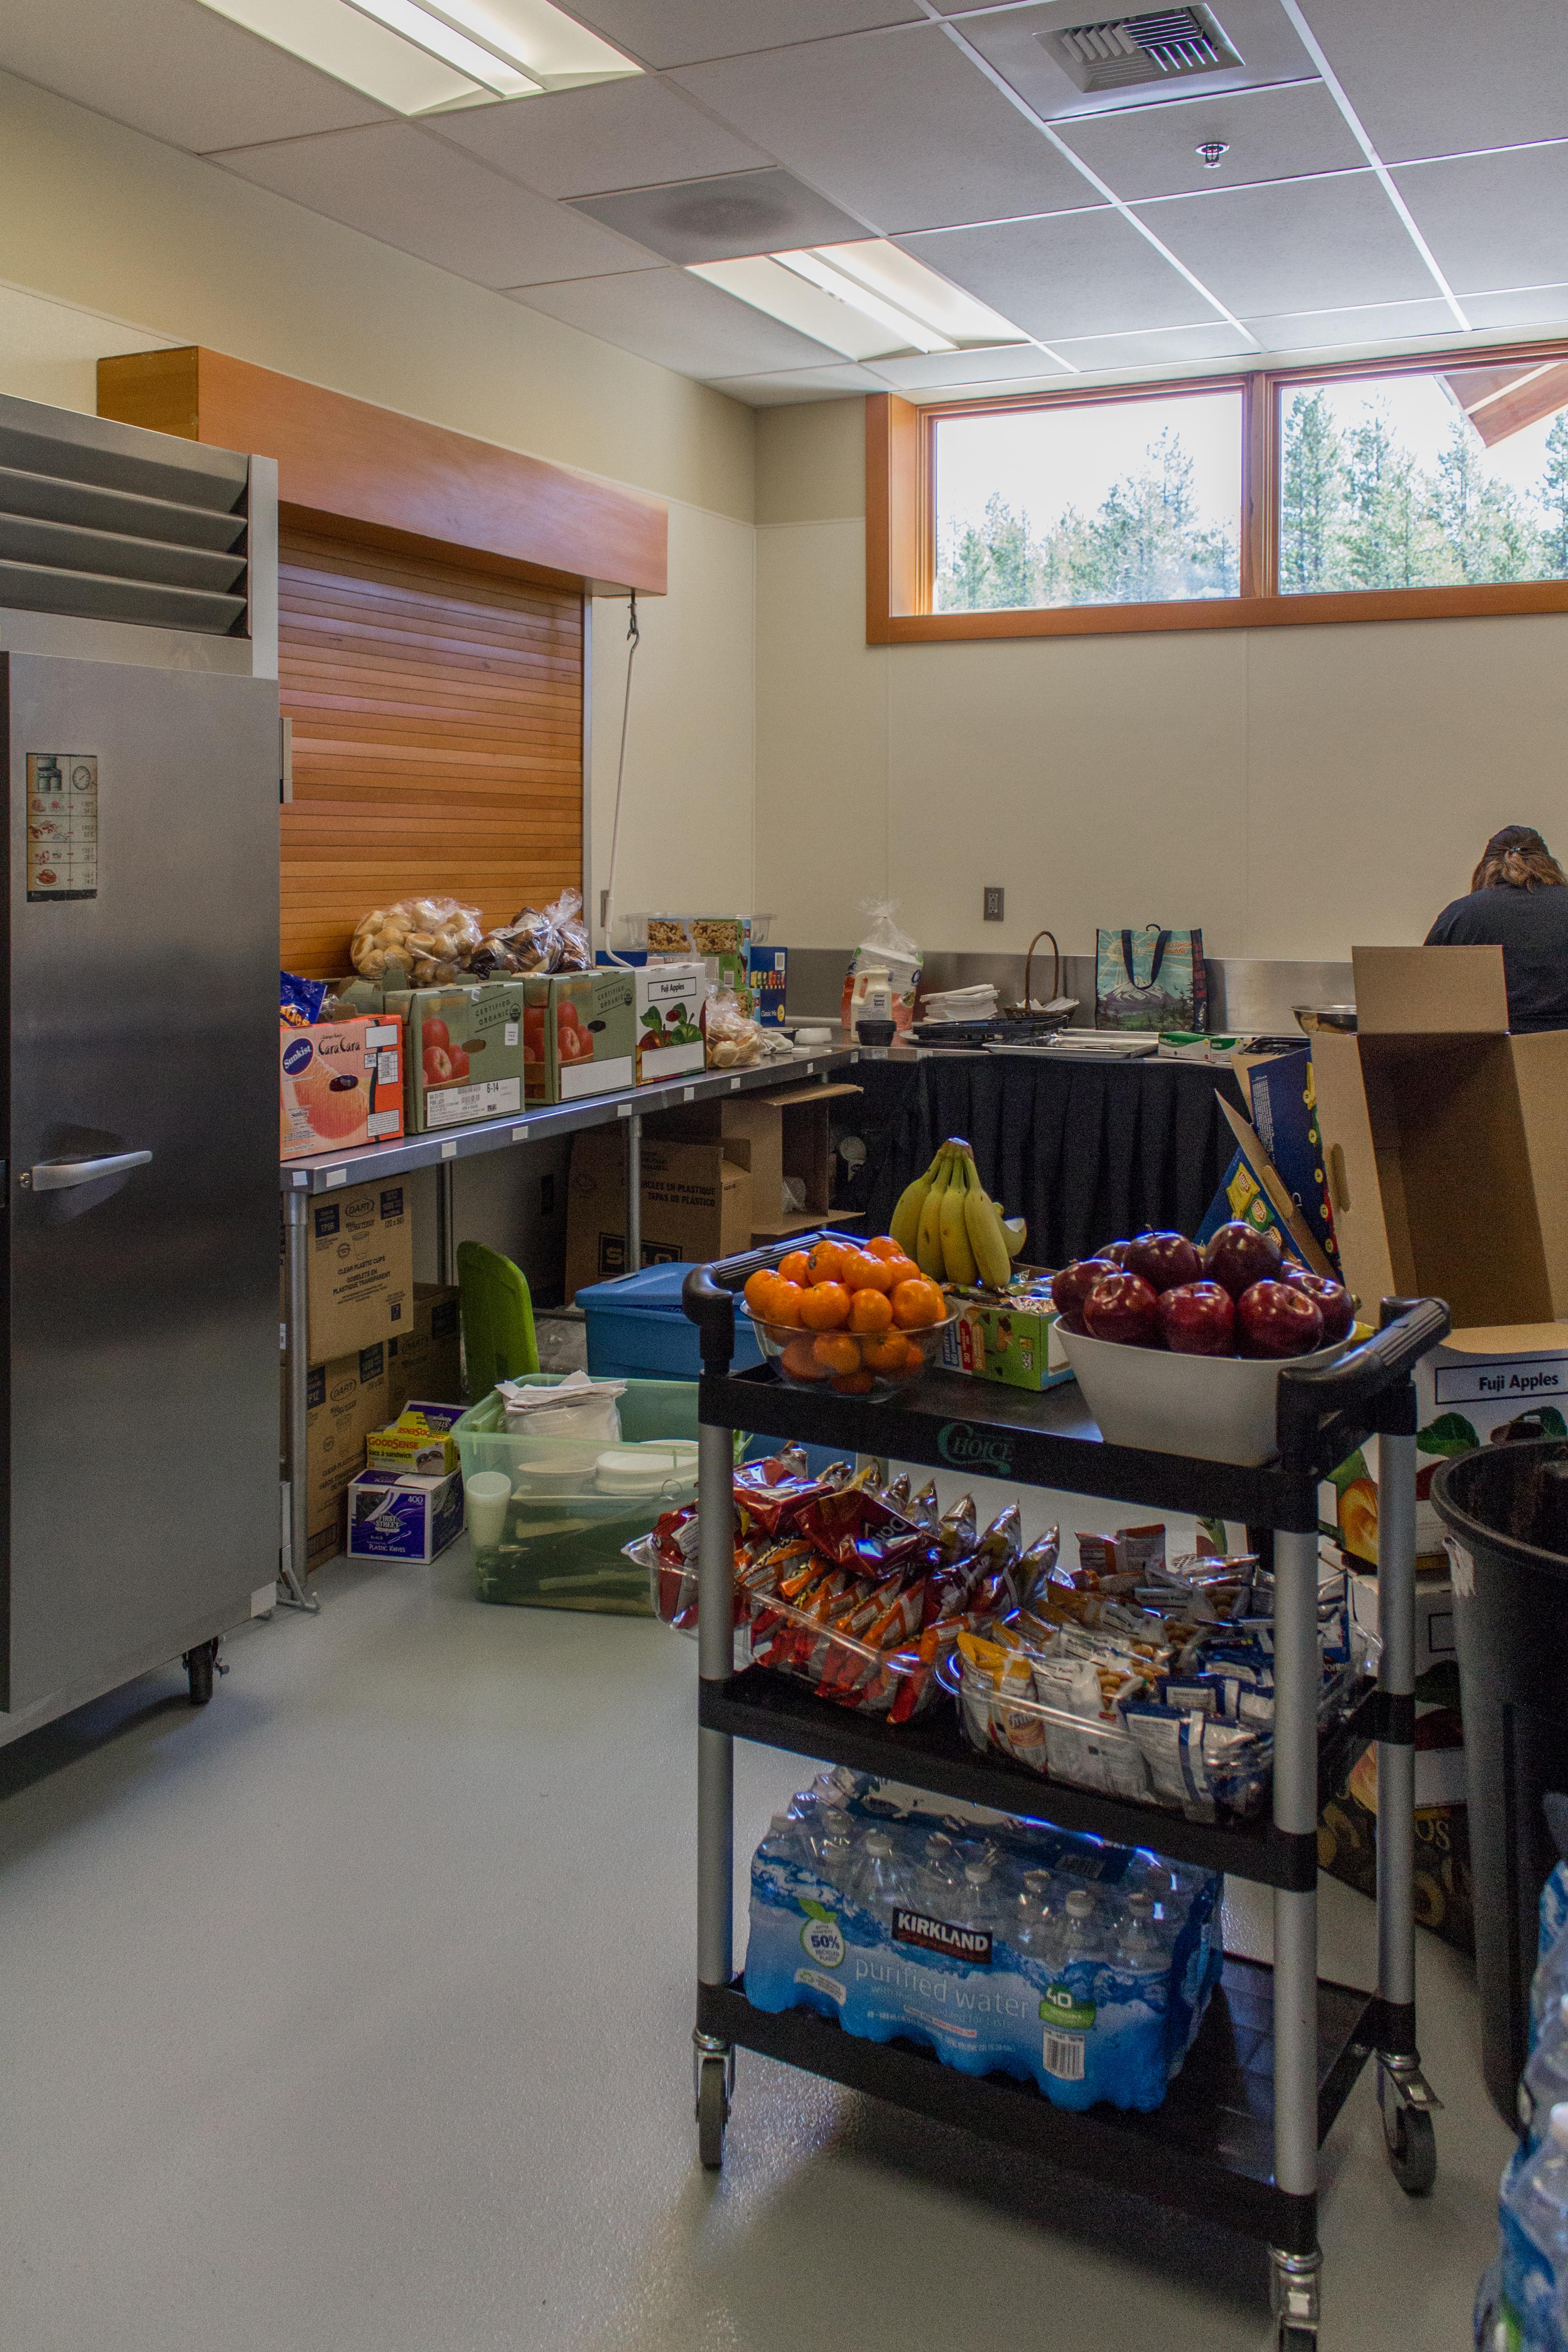 SHARC Event Hospitality Kitchen